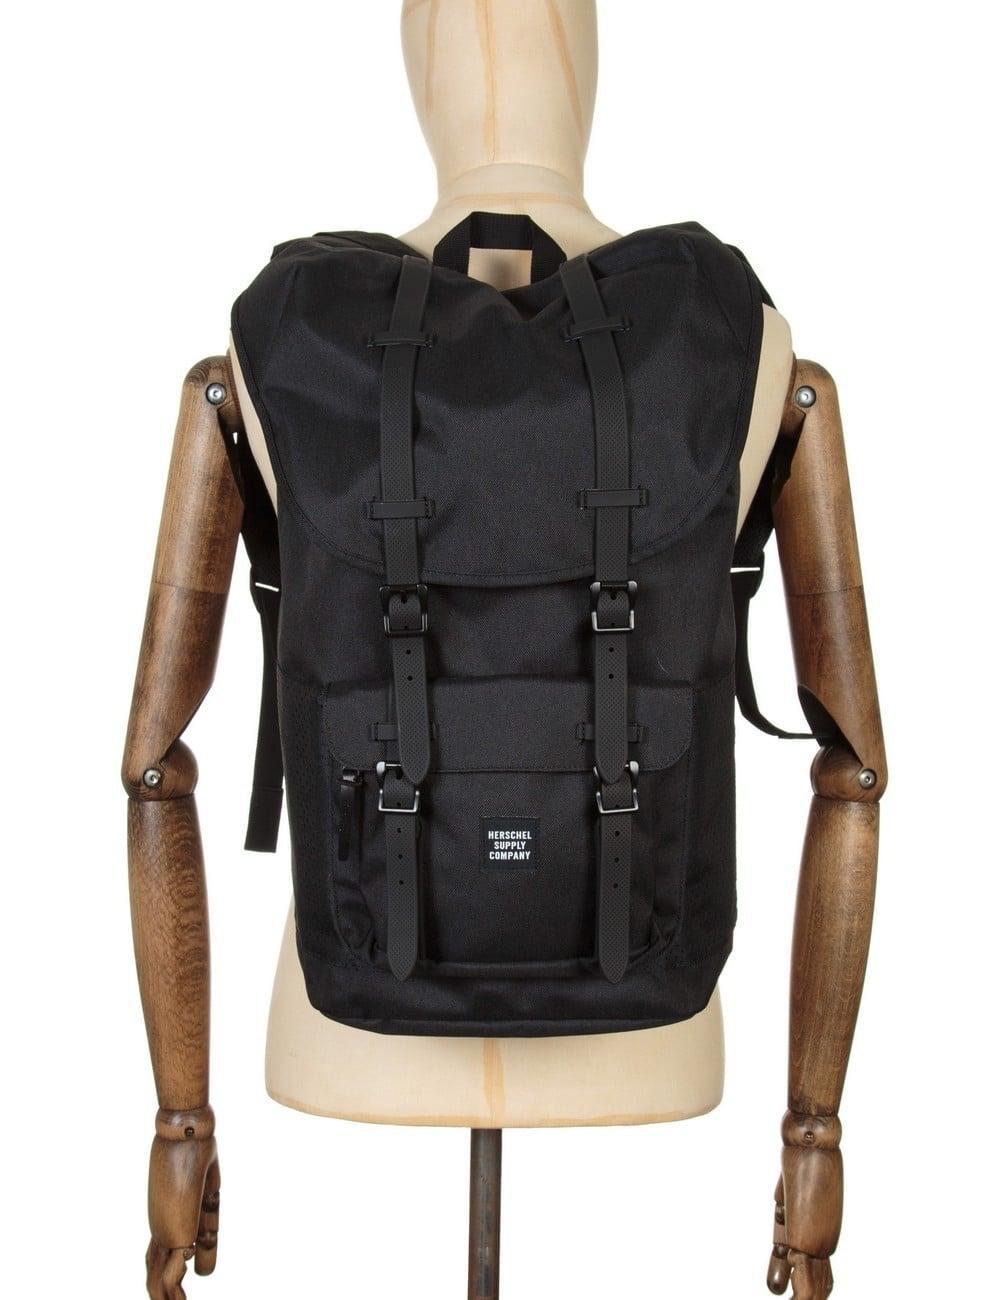 Herschel Supply Co Little America 25L Backpack - Black Black Rubber ... c76ed113cffb5